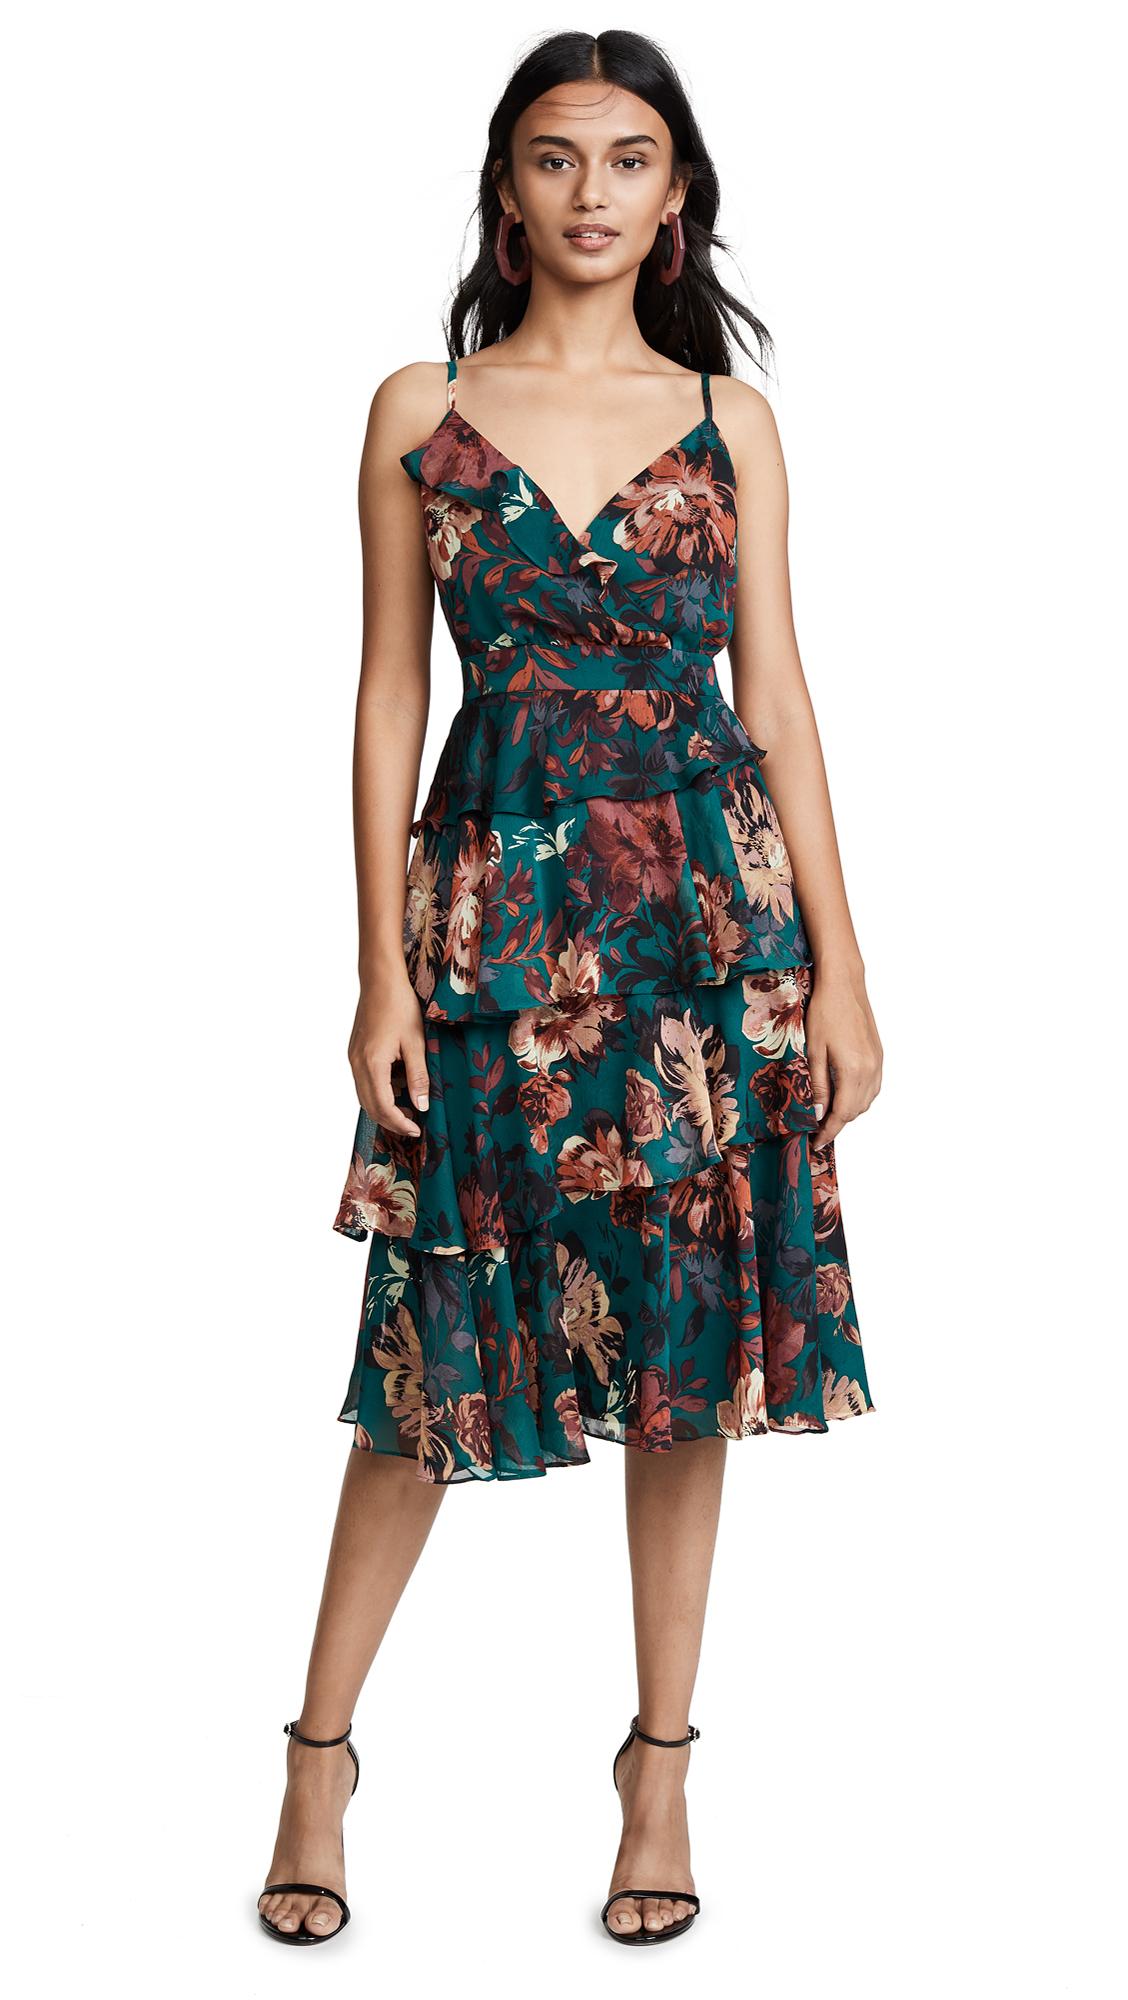 Ali & Jay Love Is All Around Midi Dress - Pine Floral